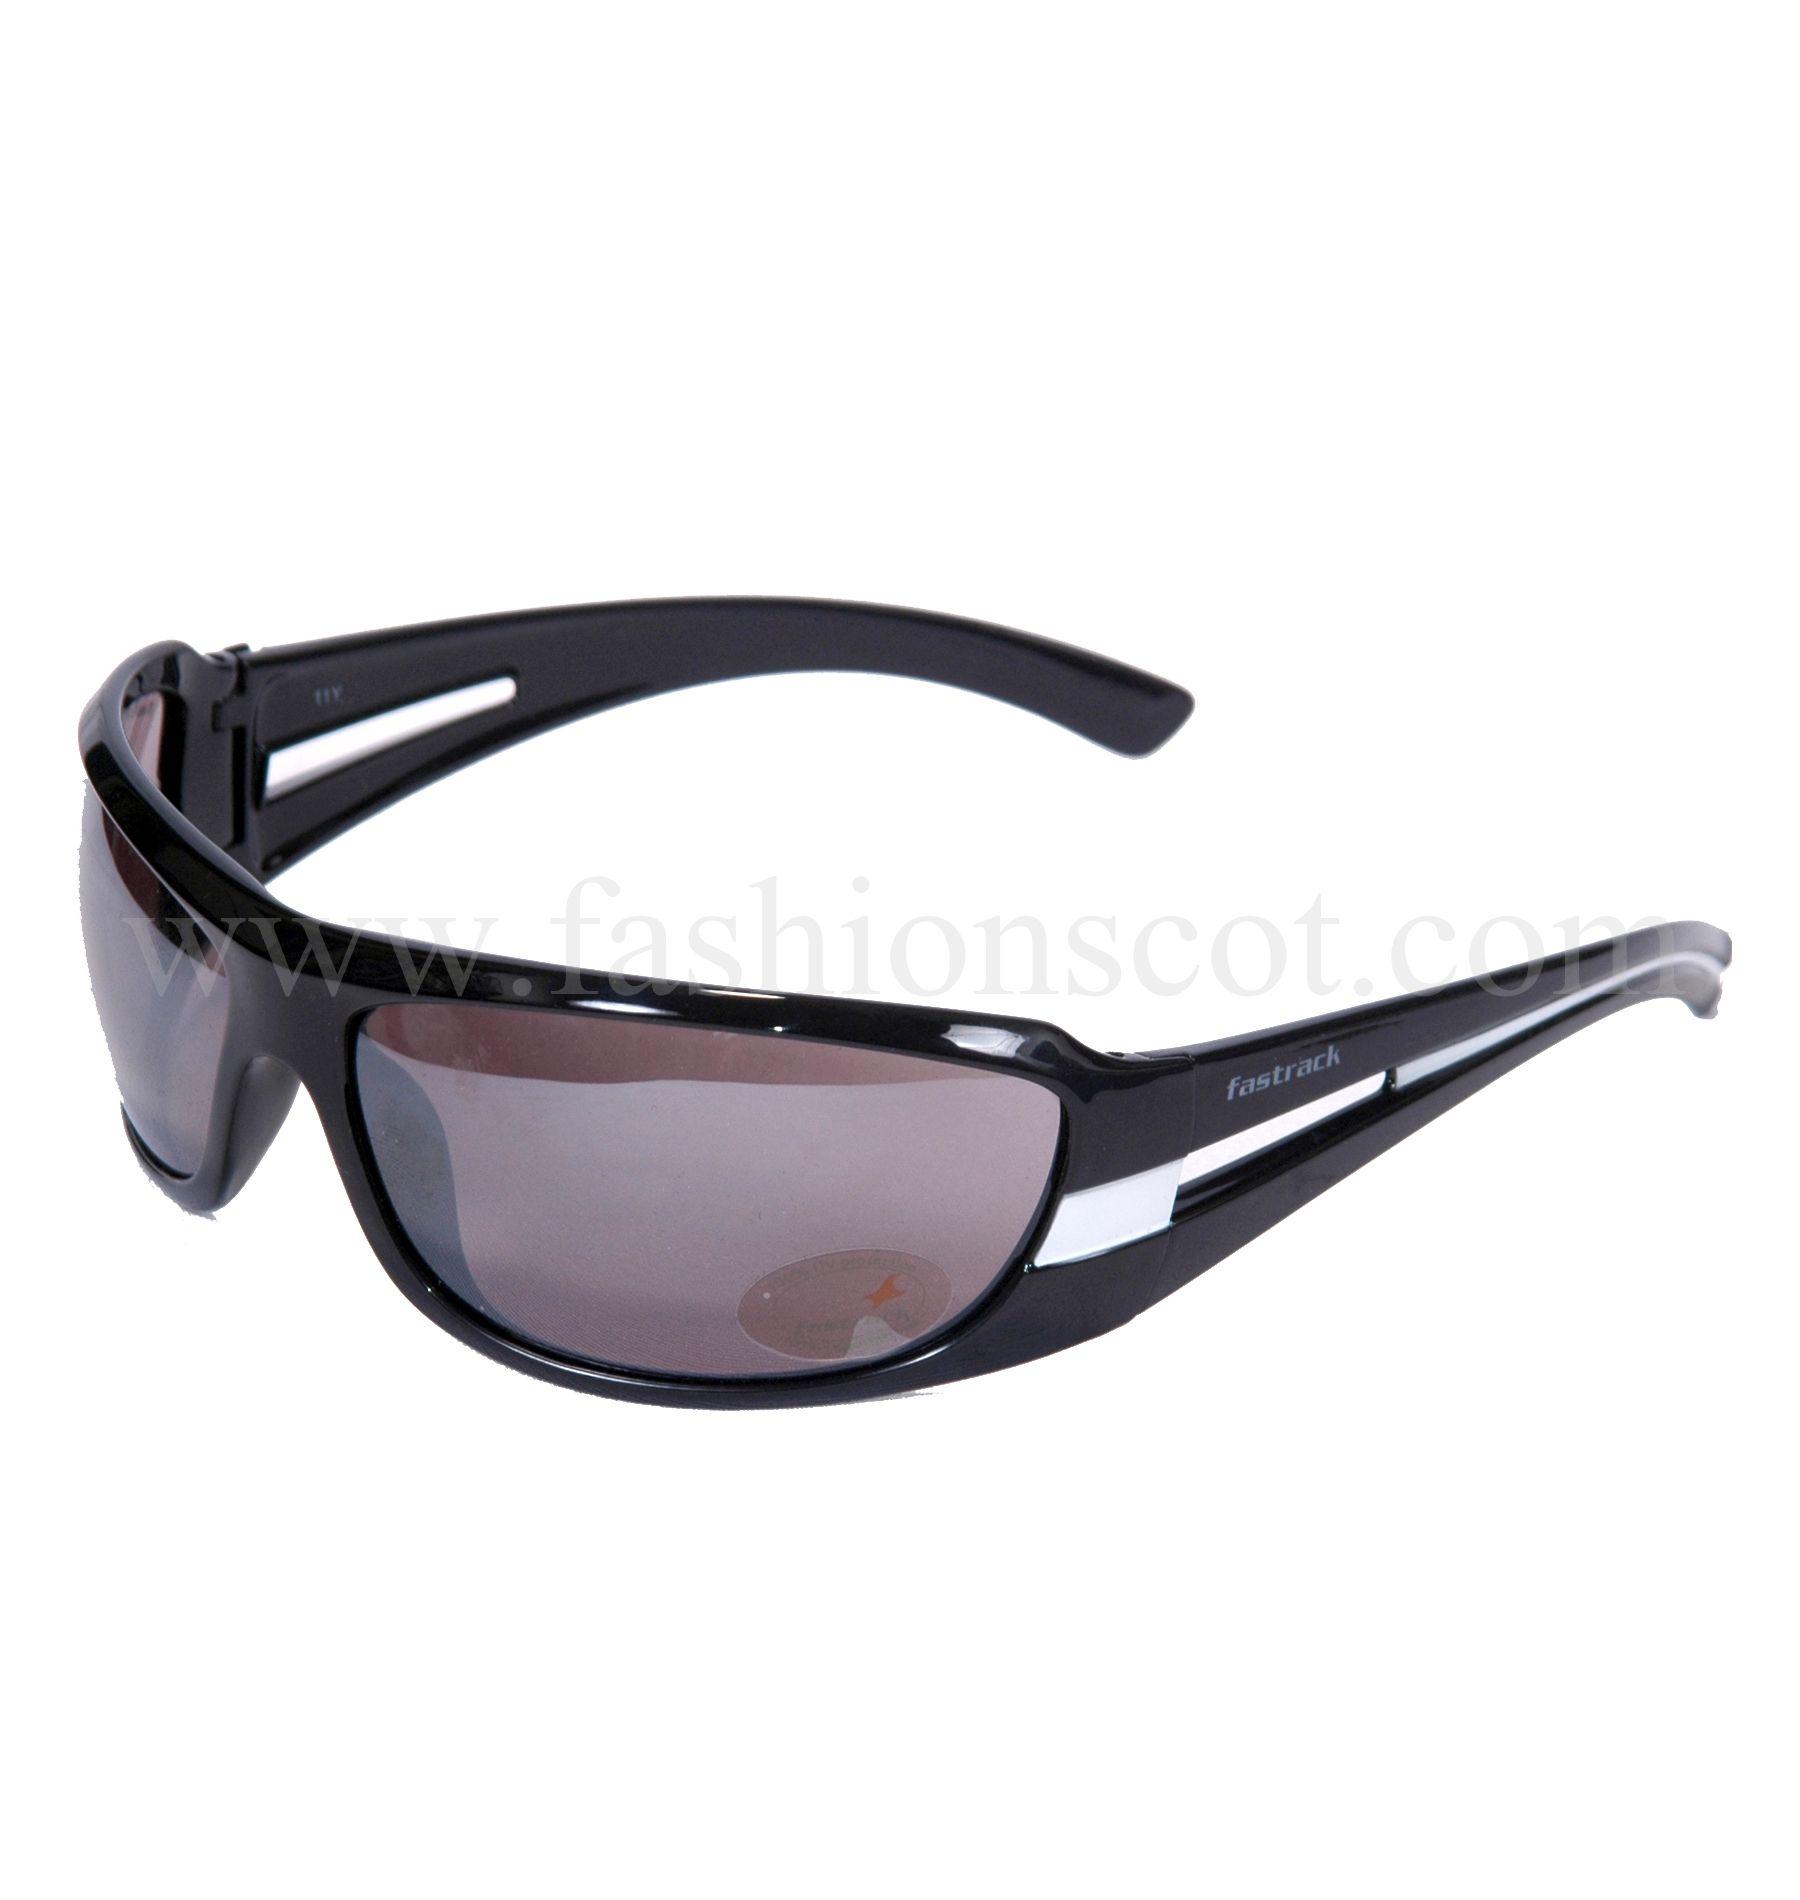 Fastrack Sunglasses Sport P204BK2 You have chosen sporty